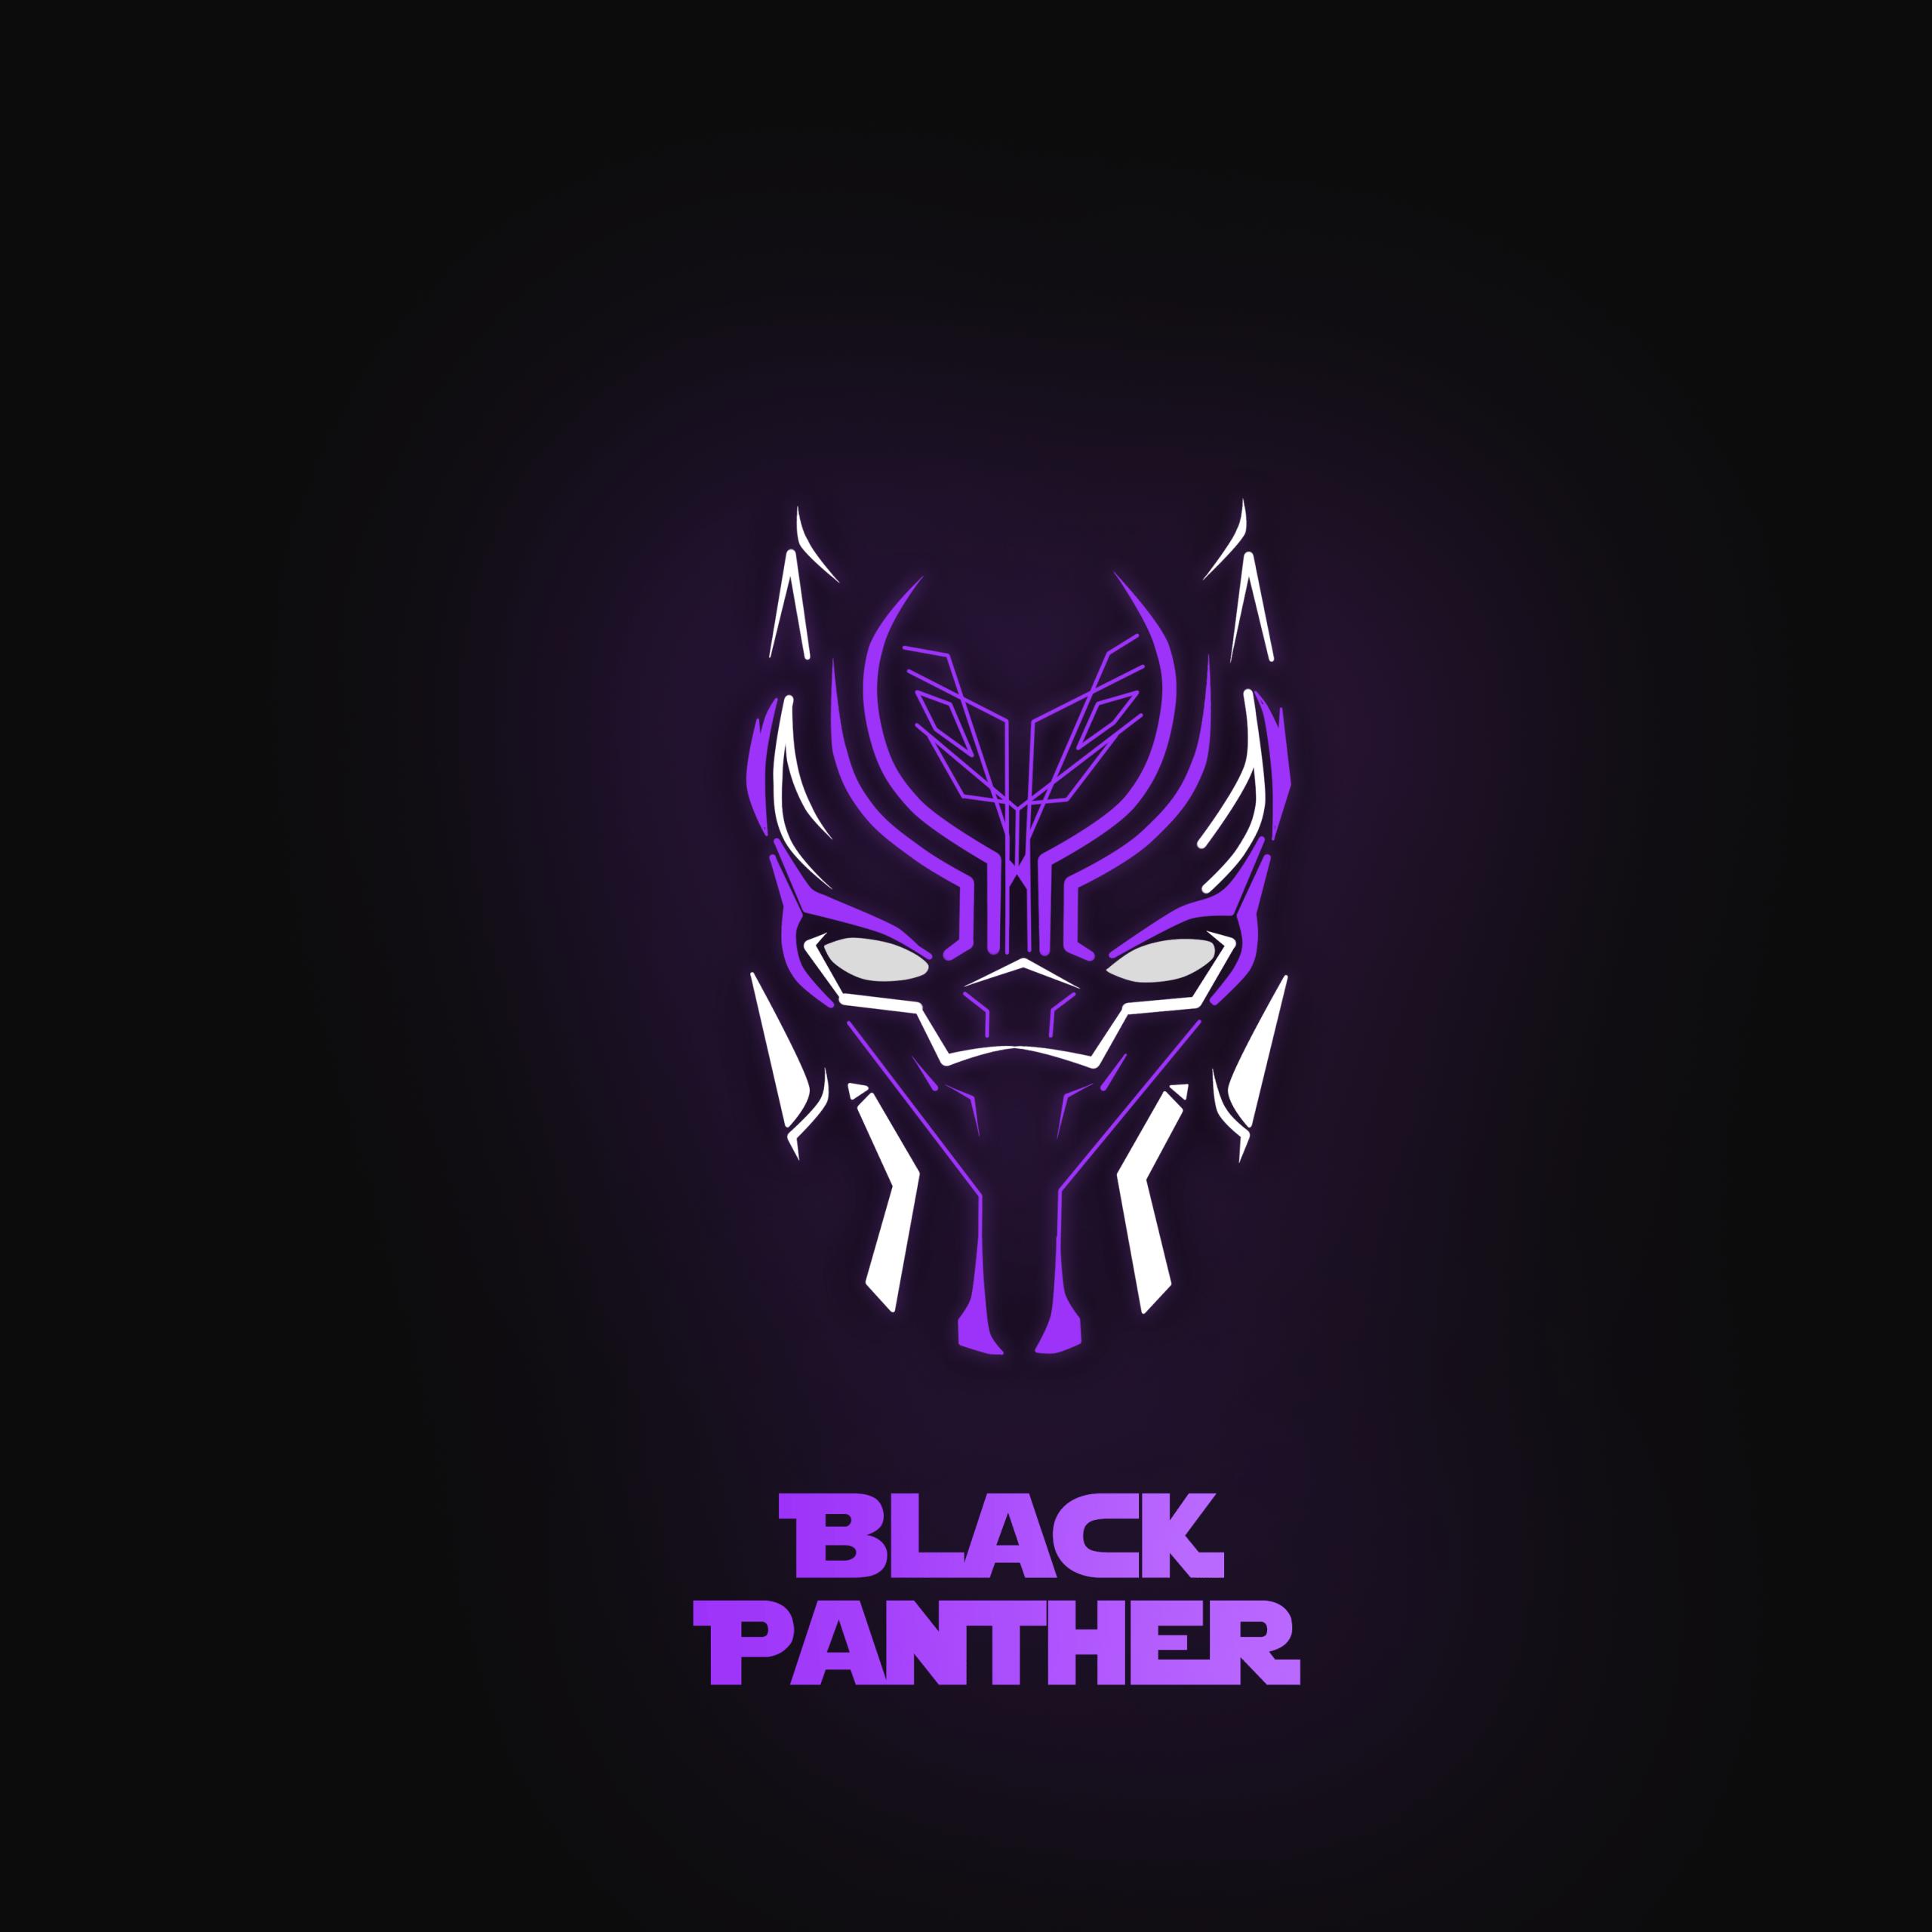 Purple Black Panther Wallpapers Top Free Purple Black Panther